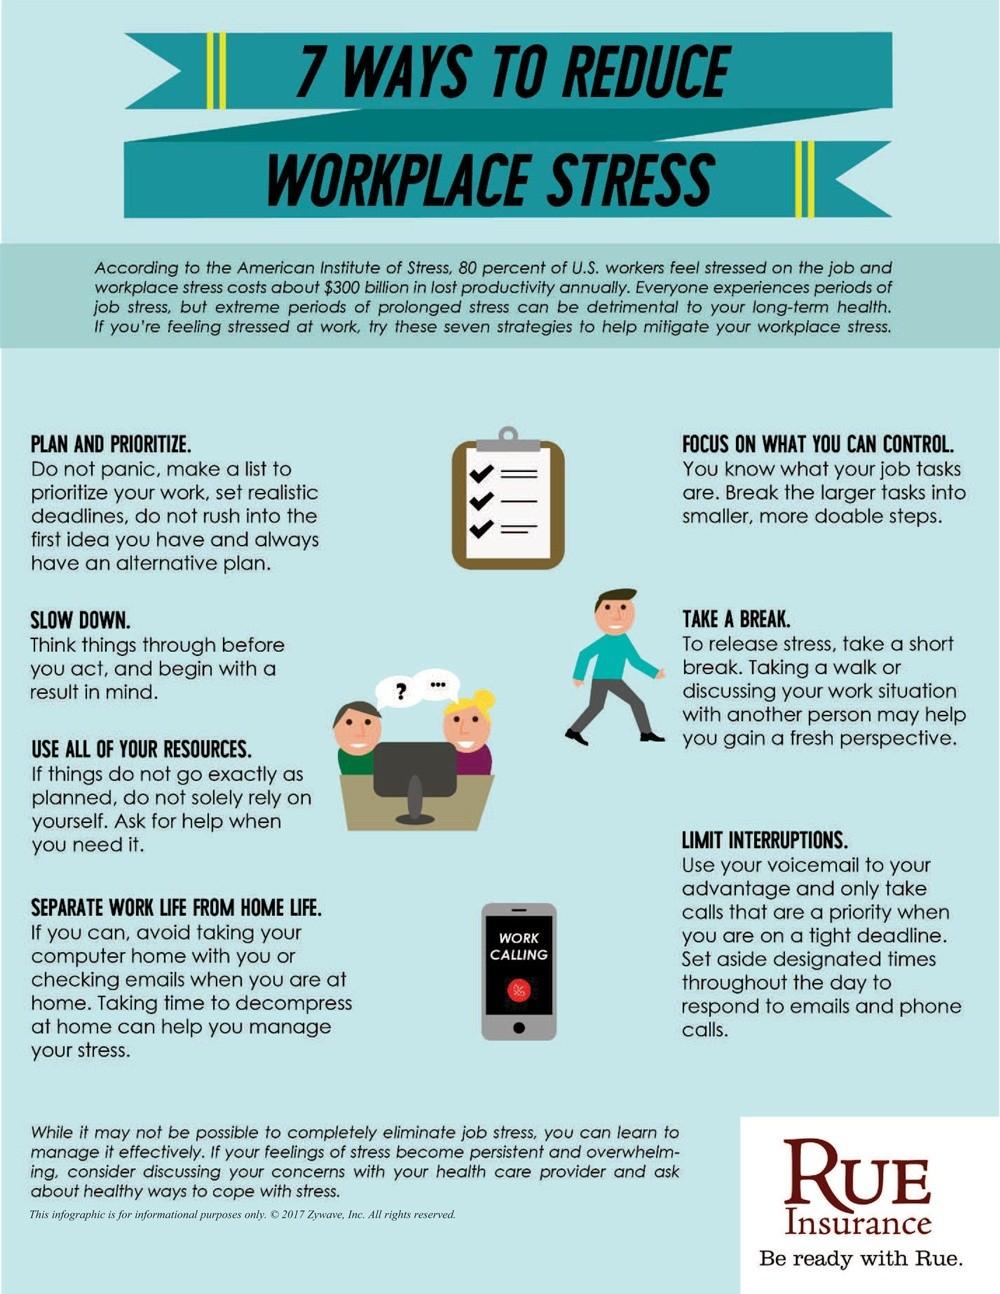 7-Ways-to-Reduce-Workplace-.jpg